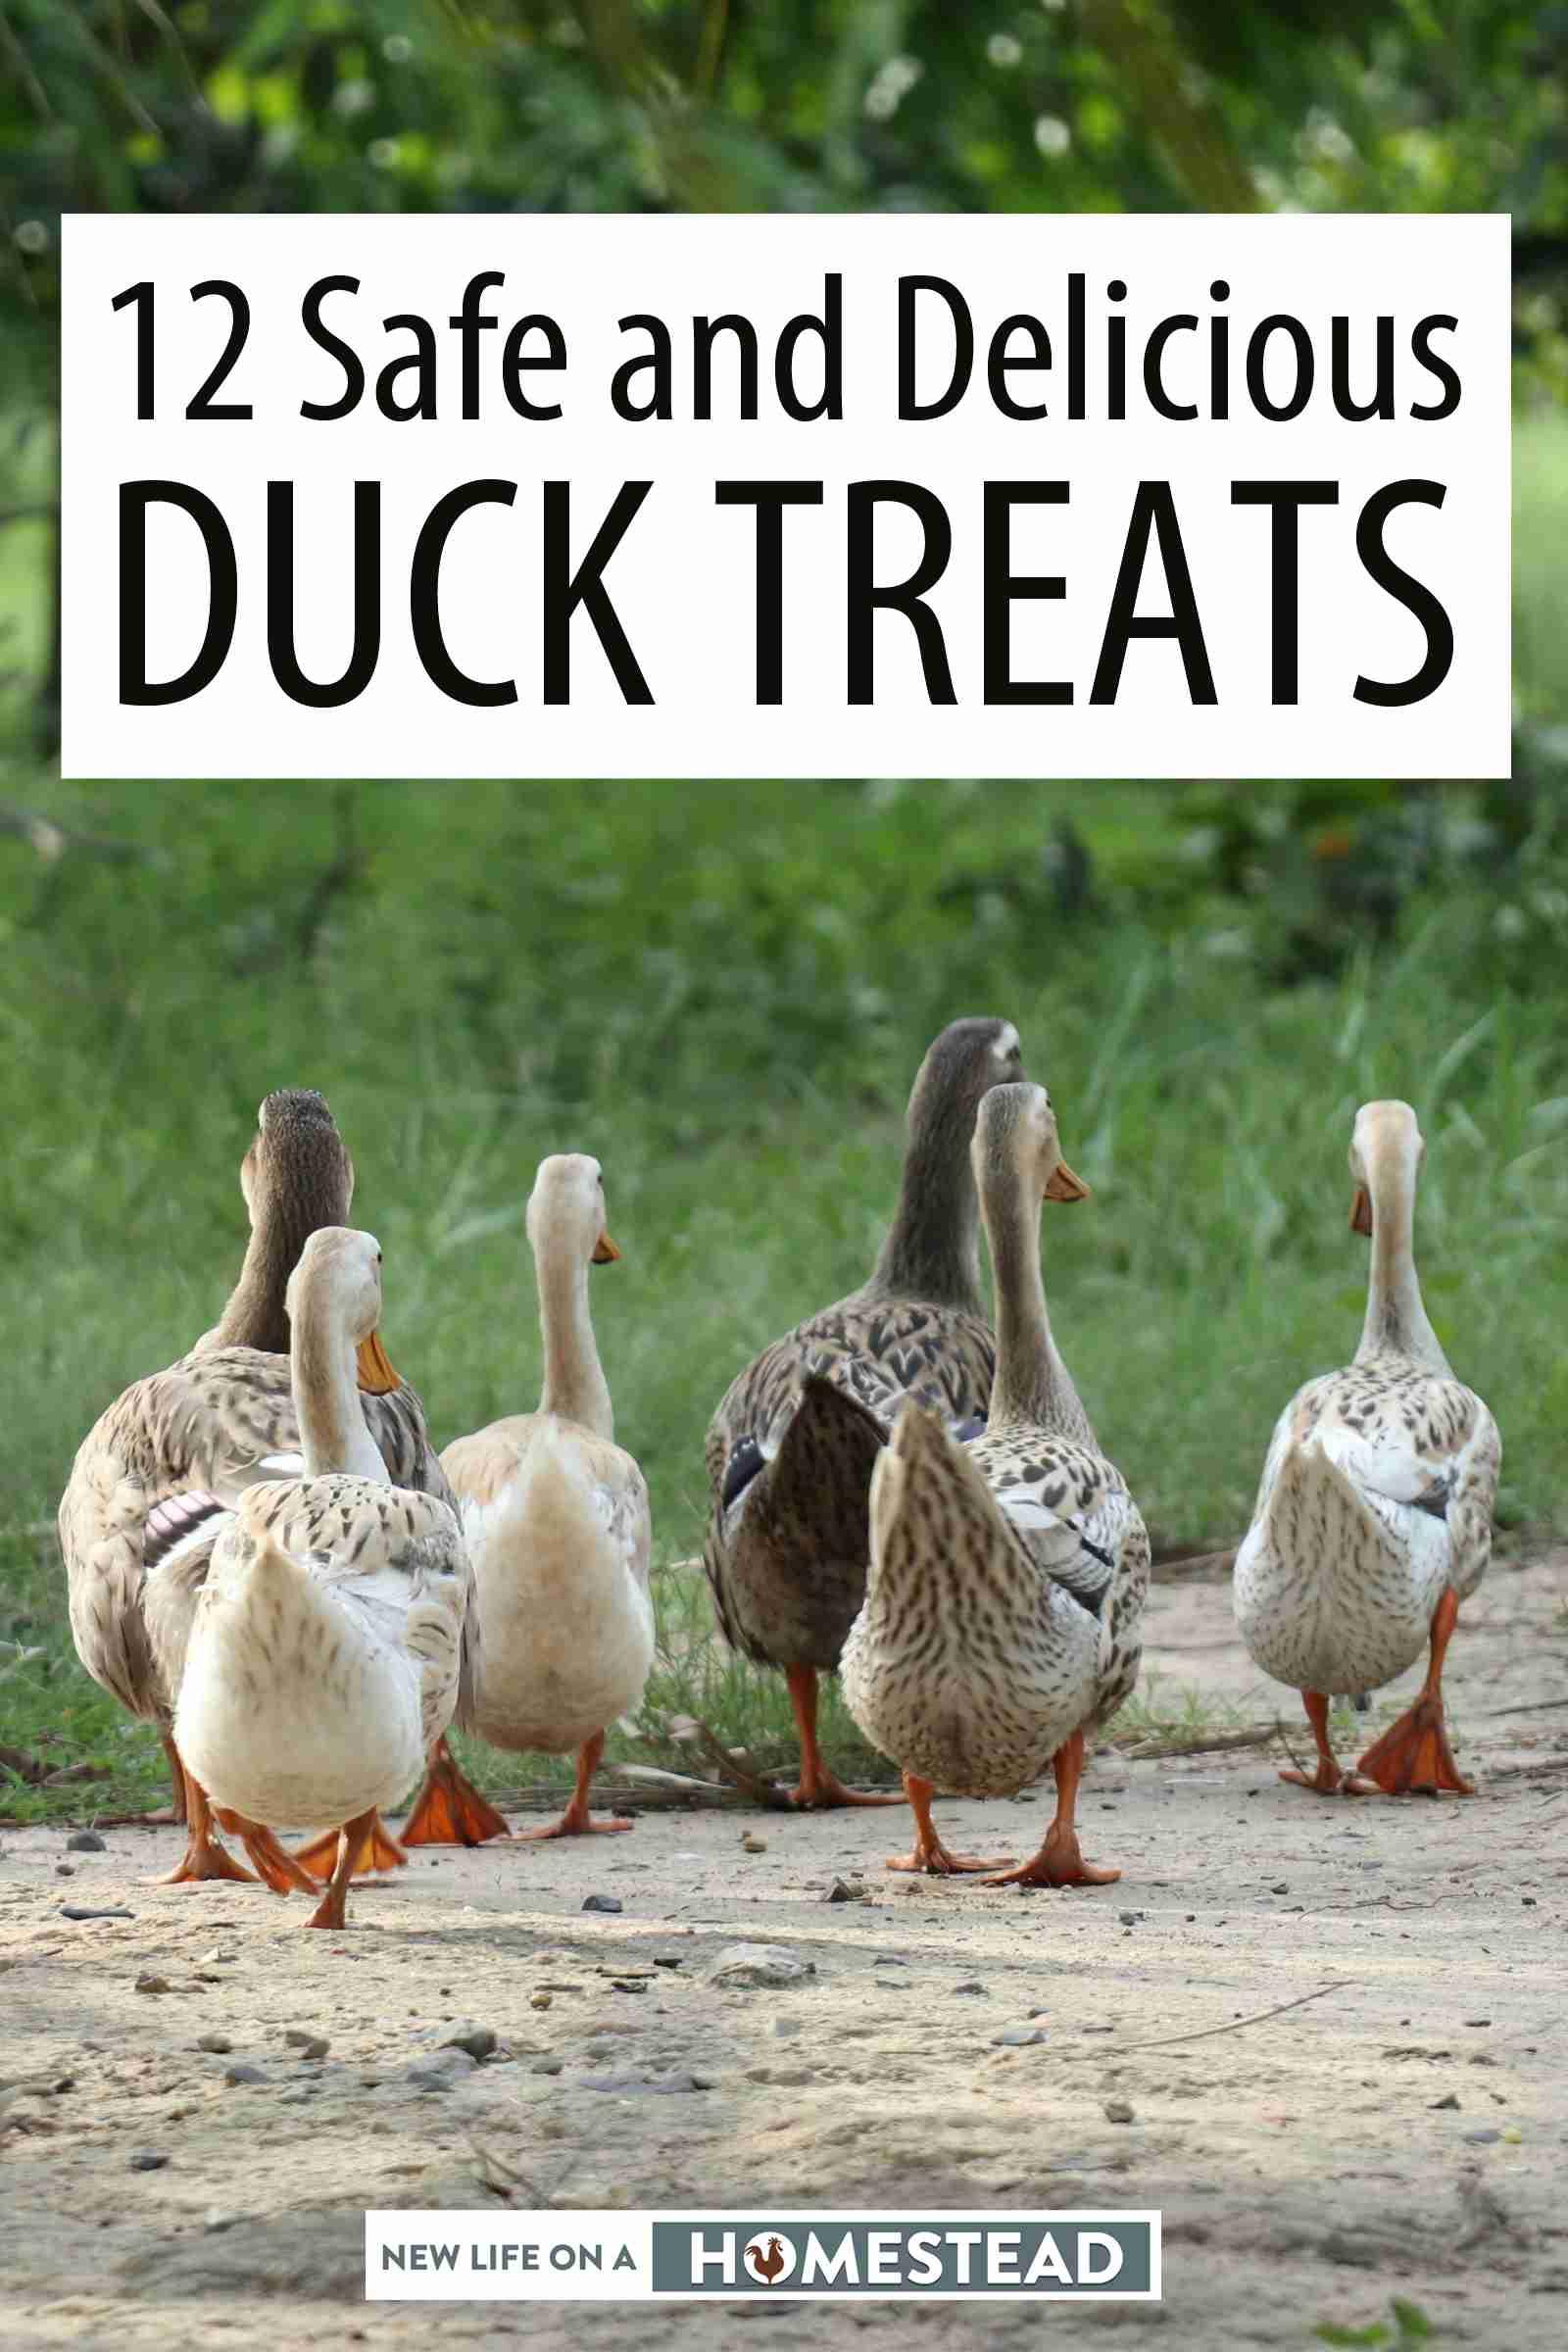 duck treats Pinterest image